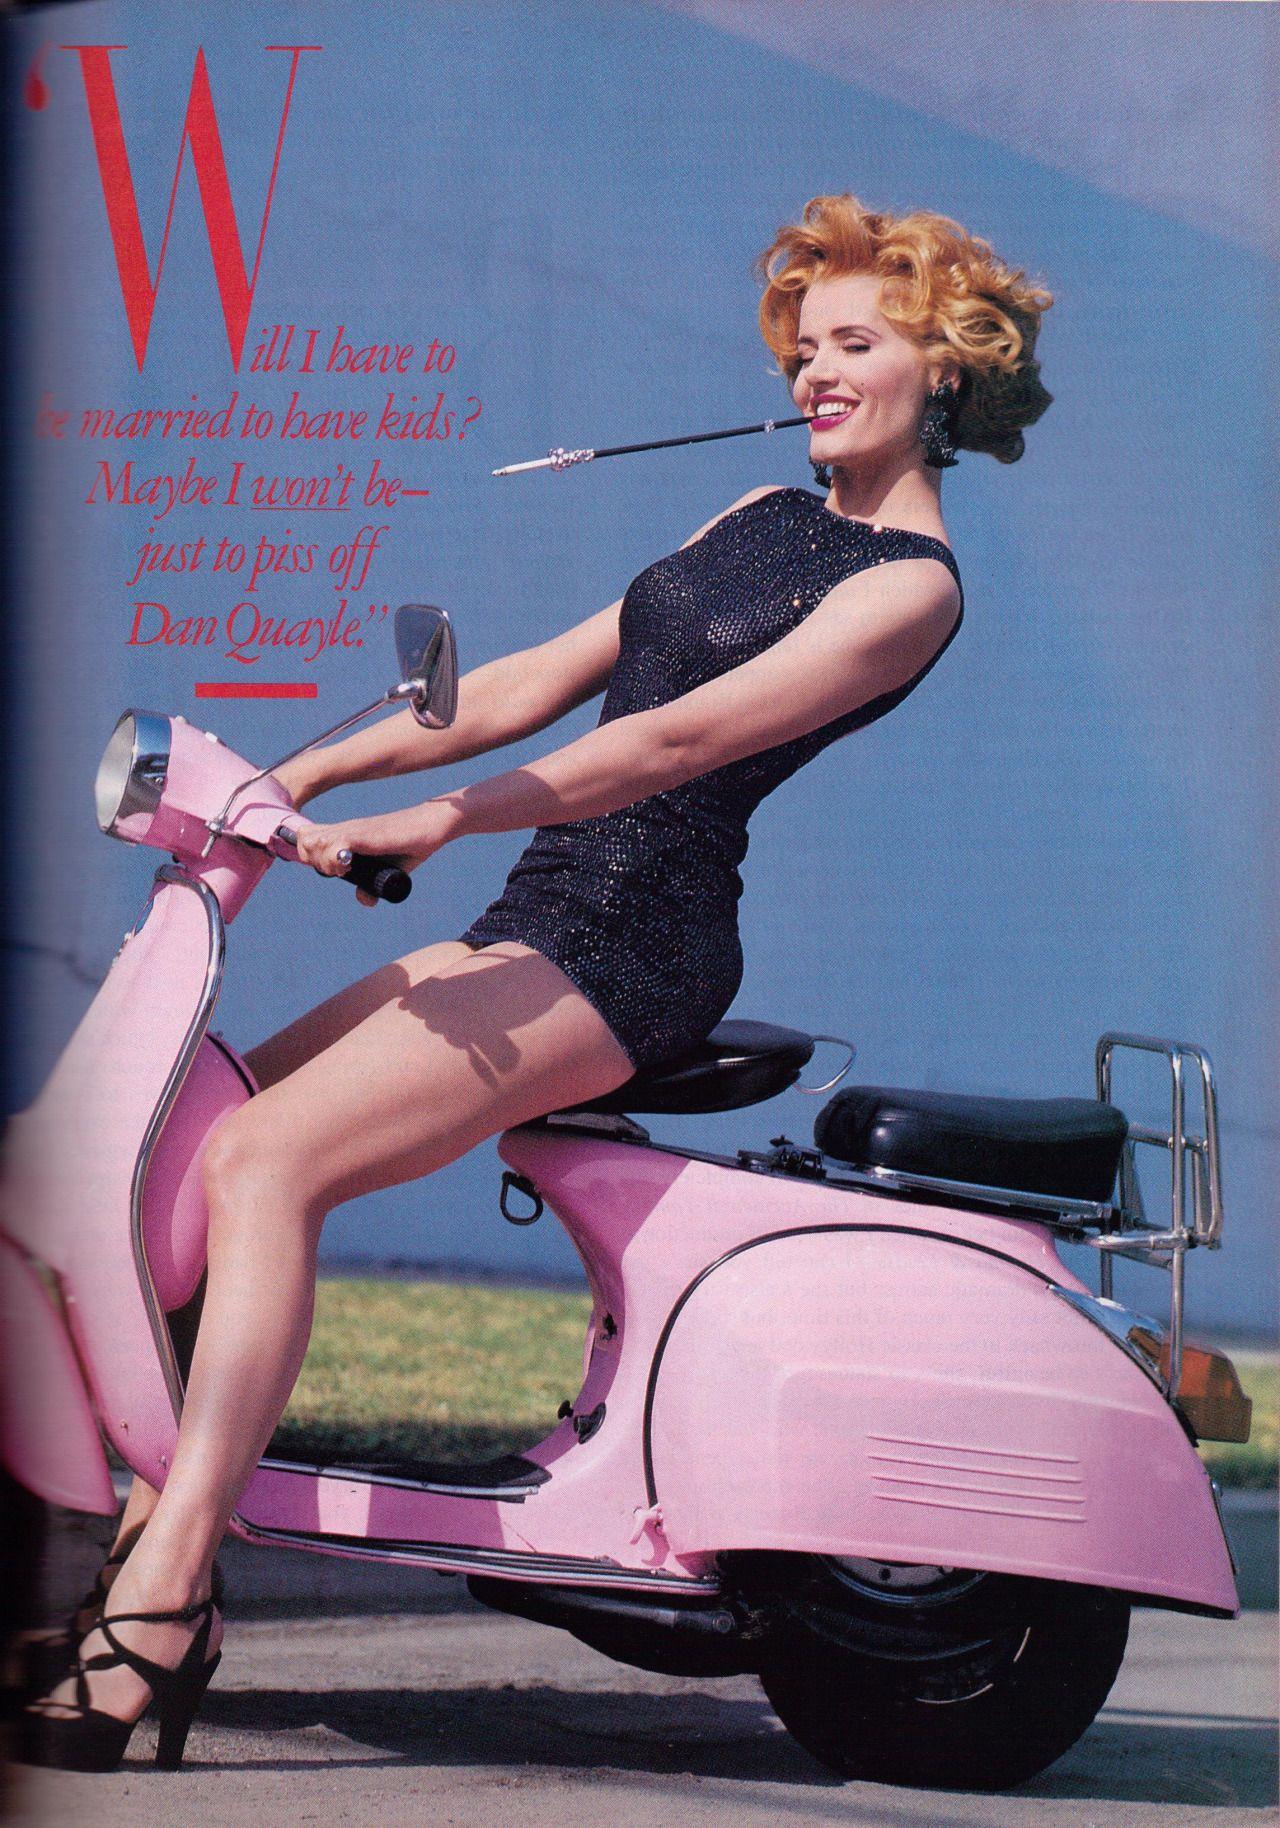 Geena Davis Cameltoe inside lyla's magazine scans | sheand a vespa | pinterest | geena davis